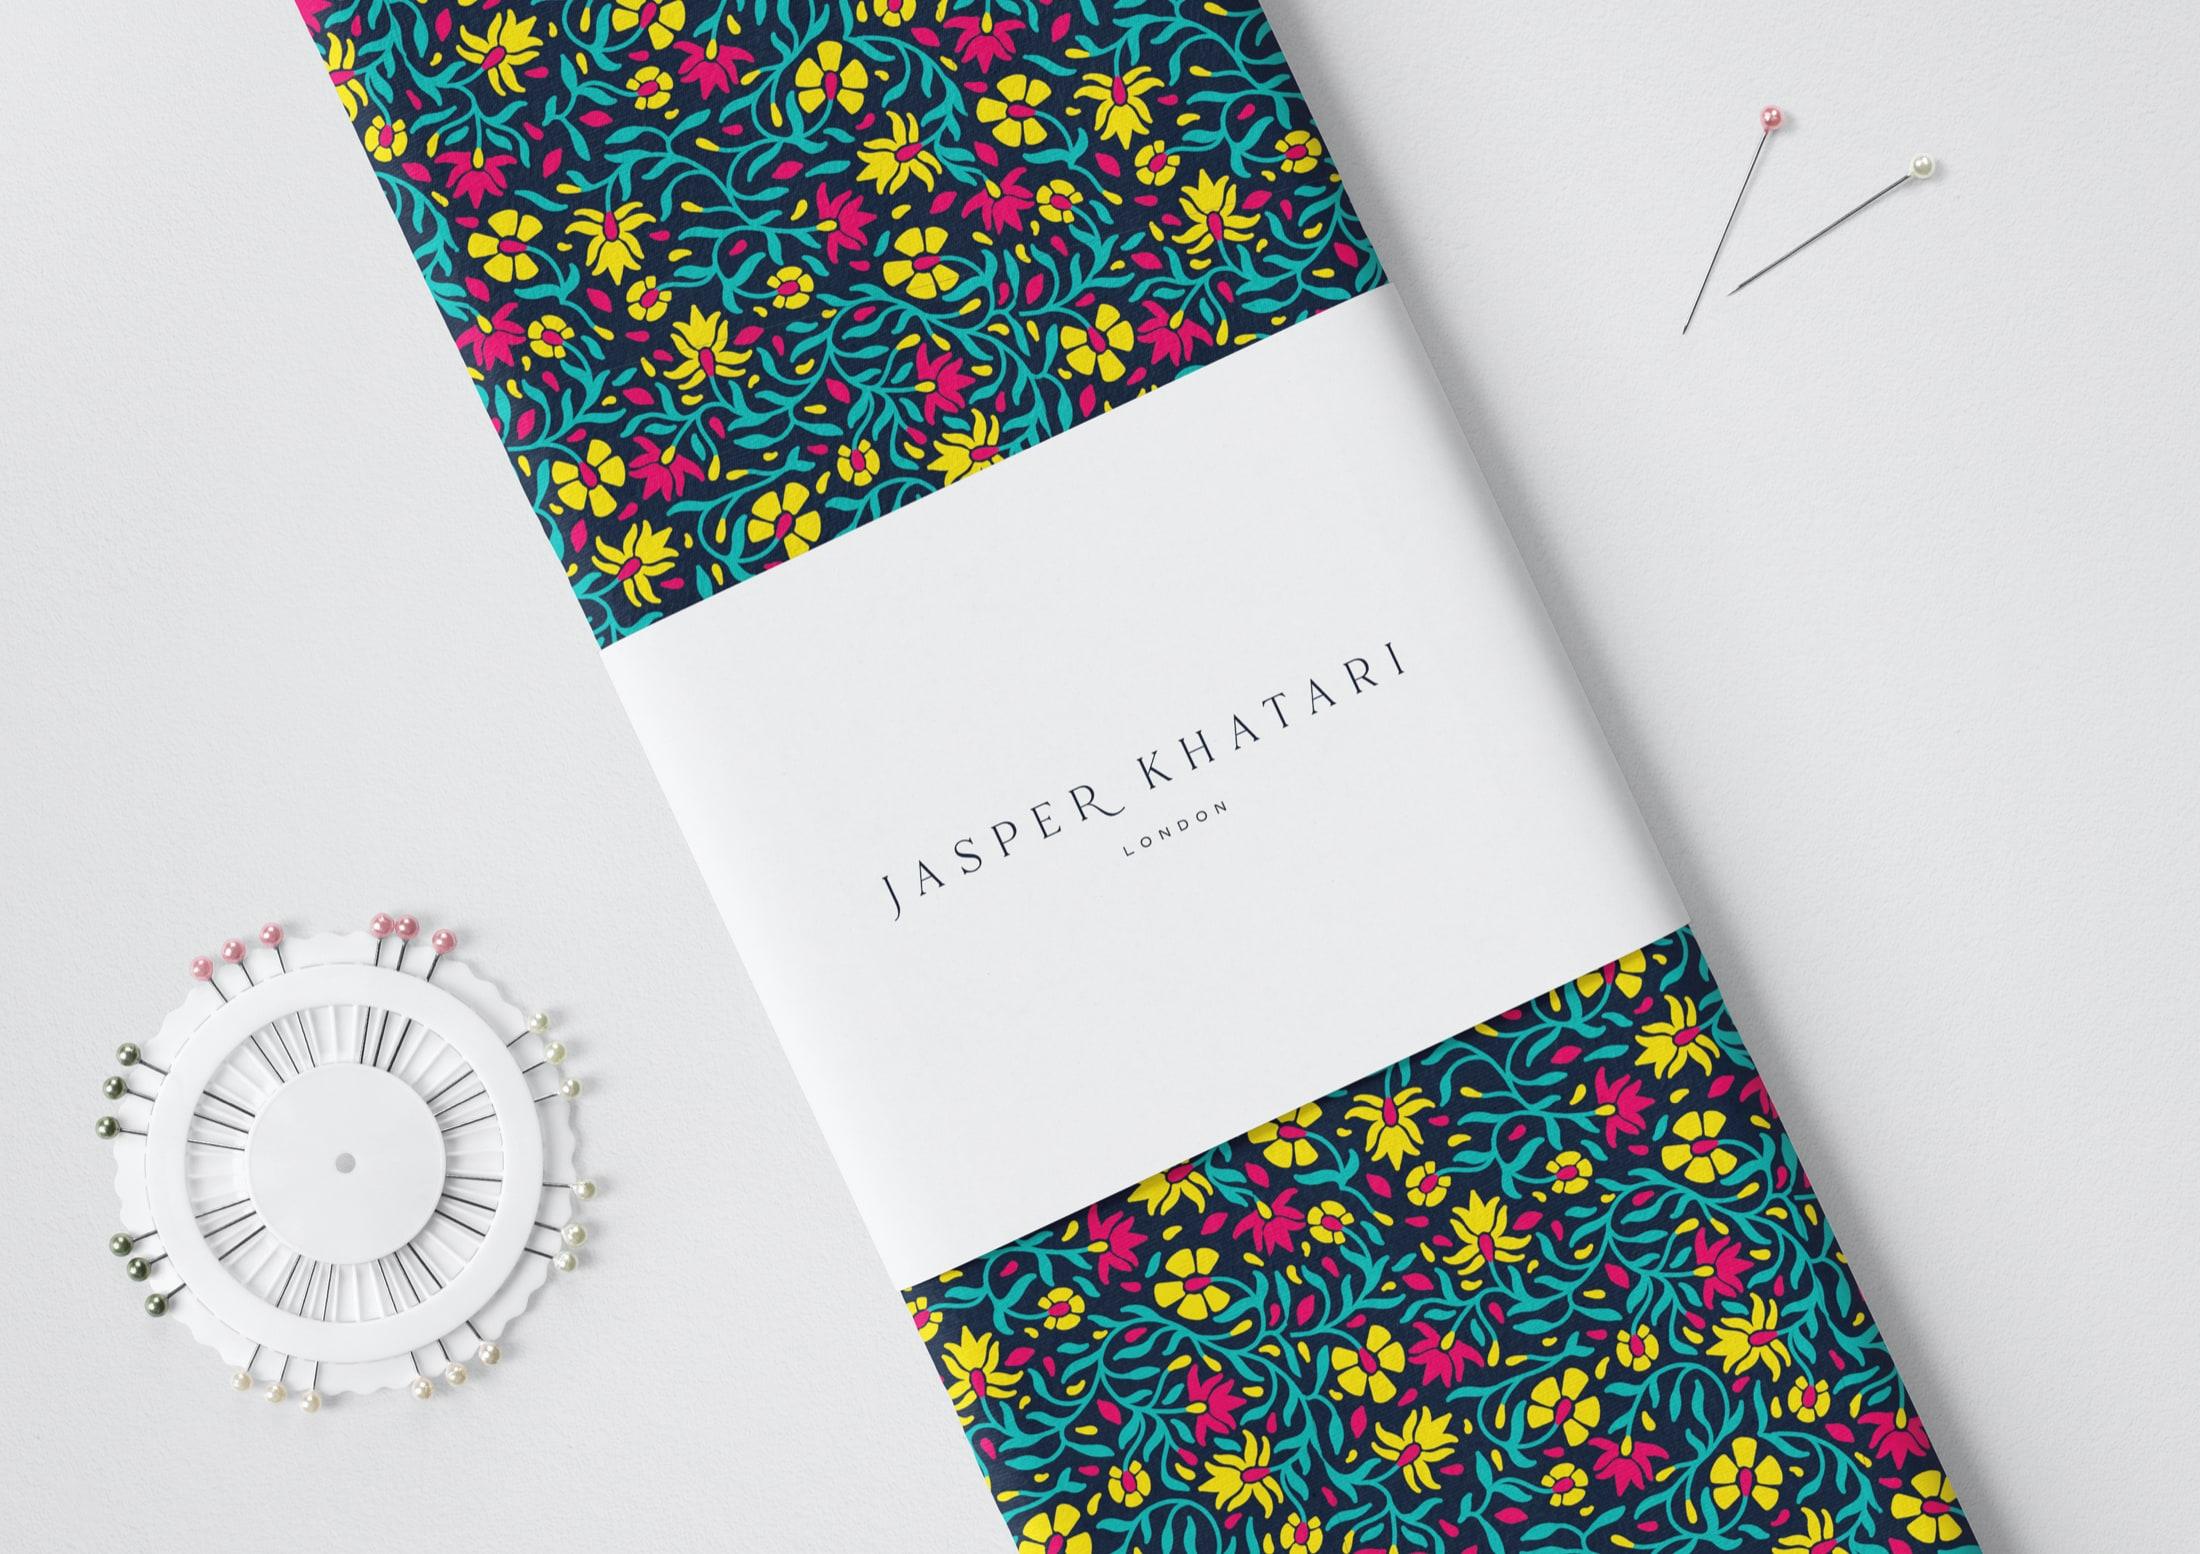 Refined, dramatic pattern design for Savile Row tailor, Jasper Khatari